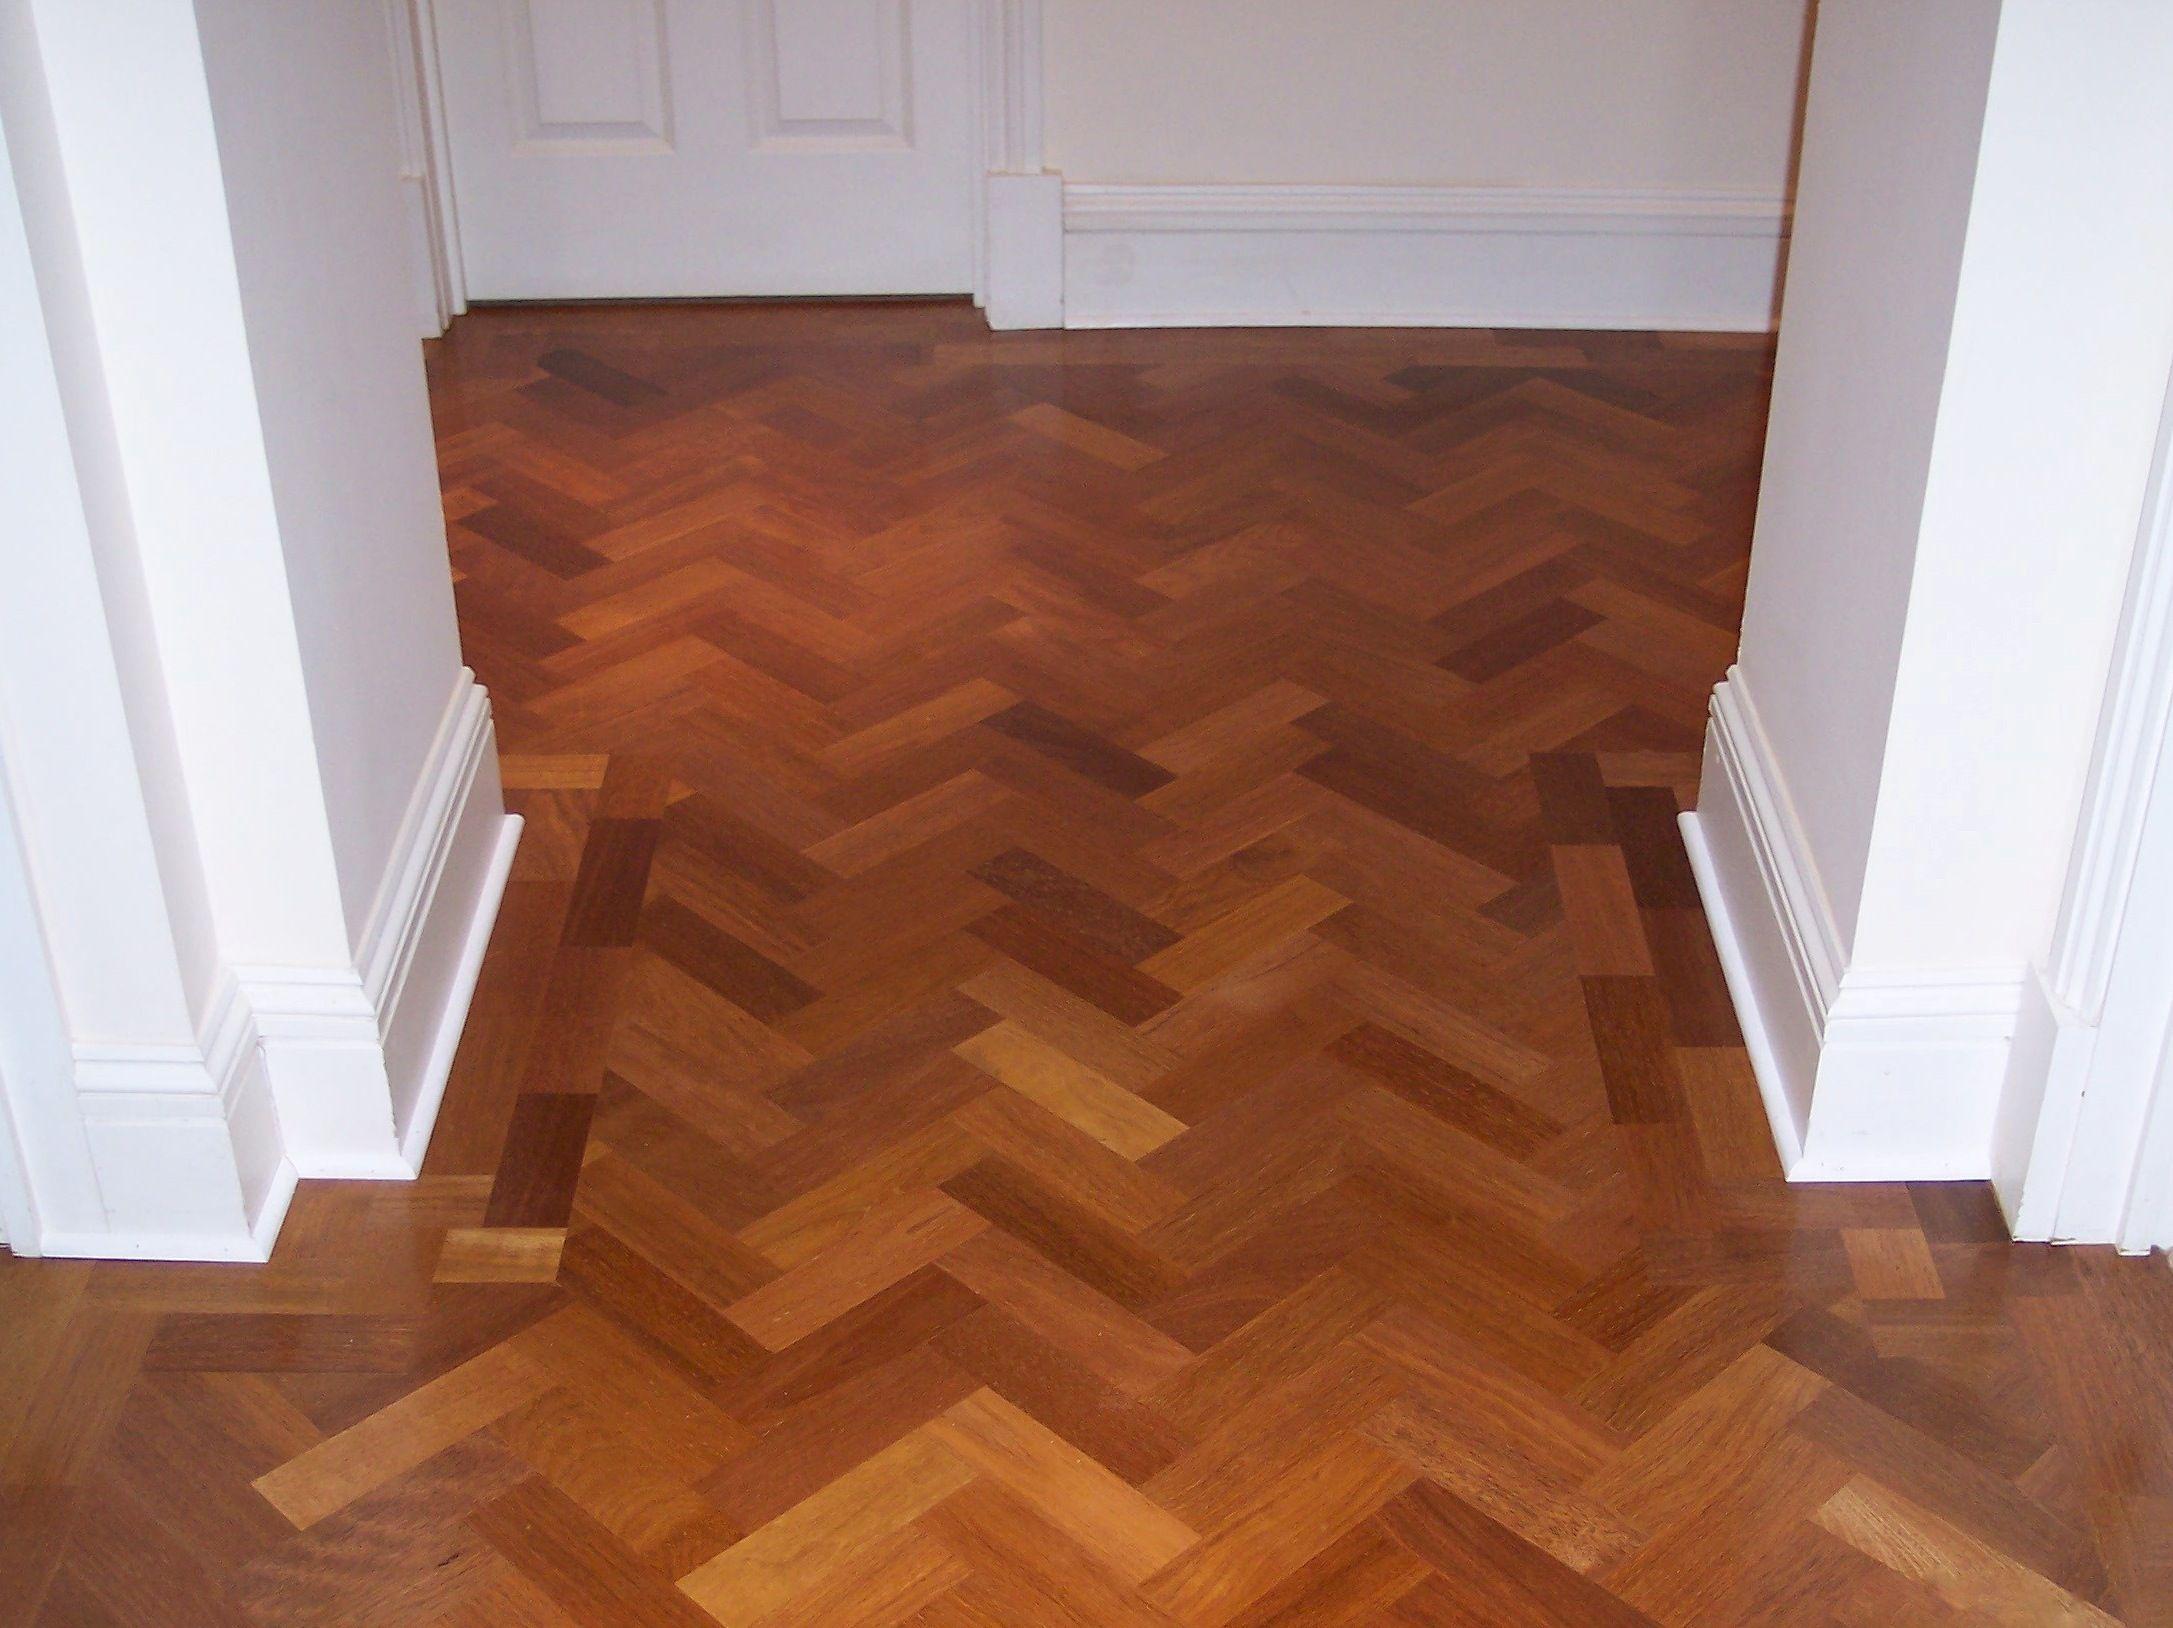 Merbau Parquet Wooden Flooringwood